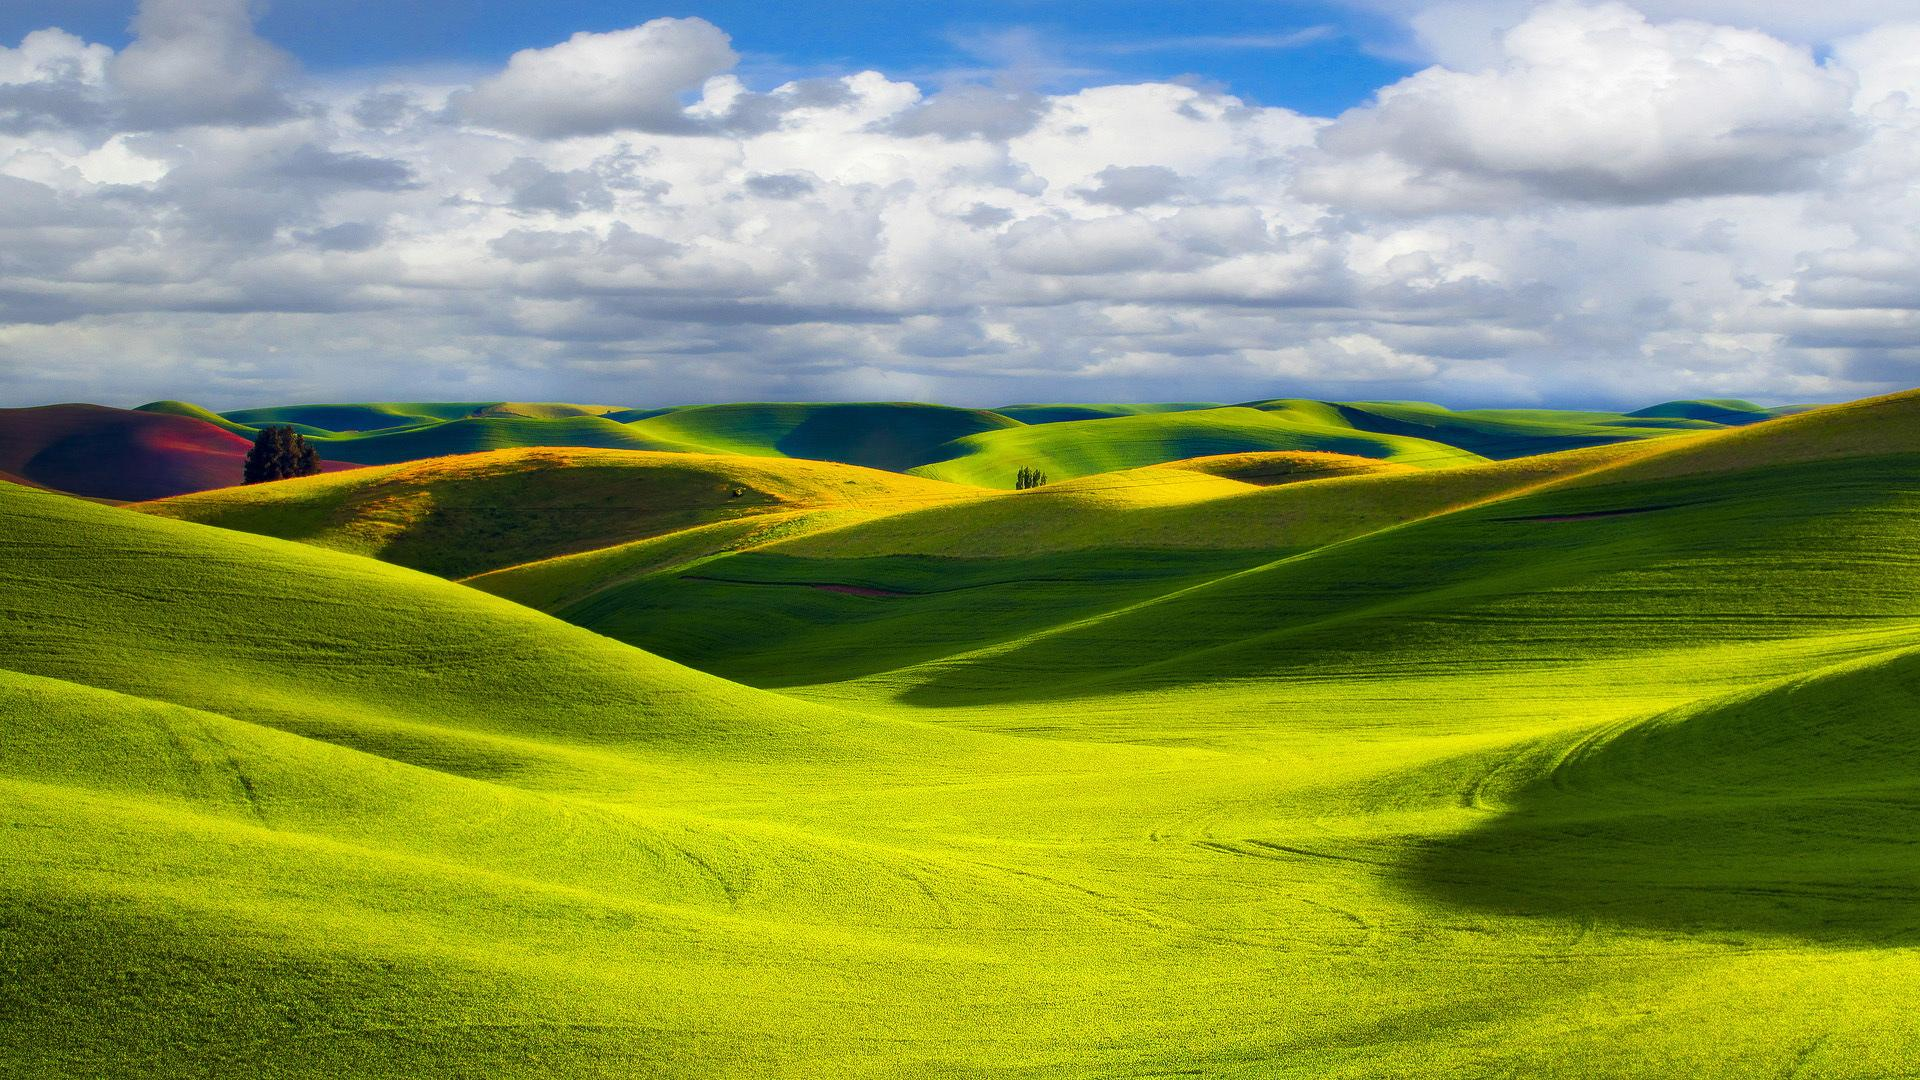 Beautiful Grassland Scenery Widescreen Wallpaper